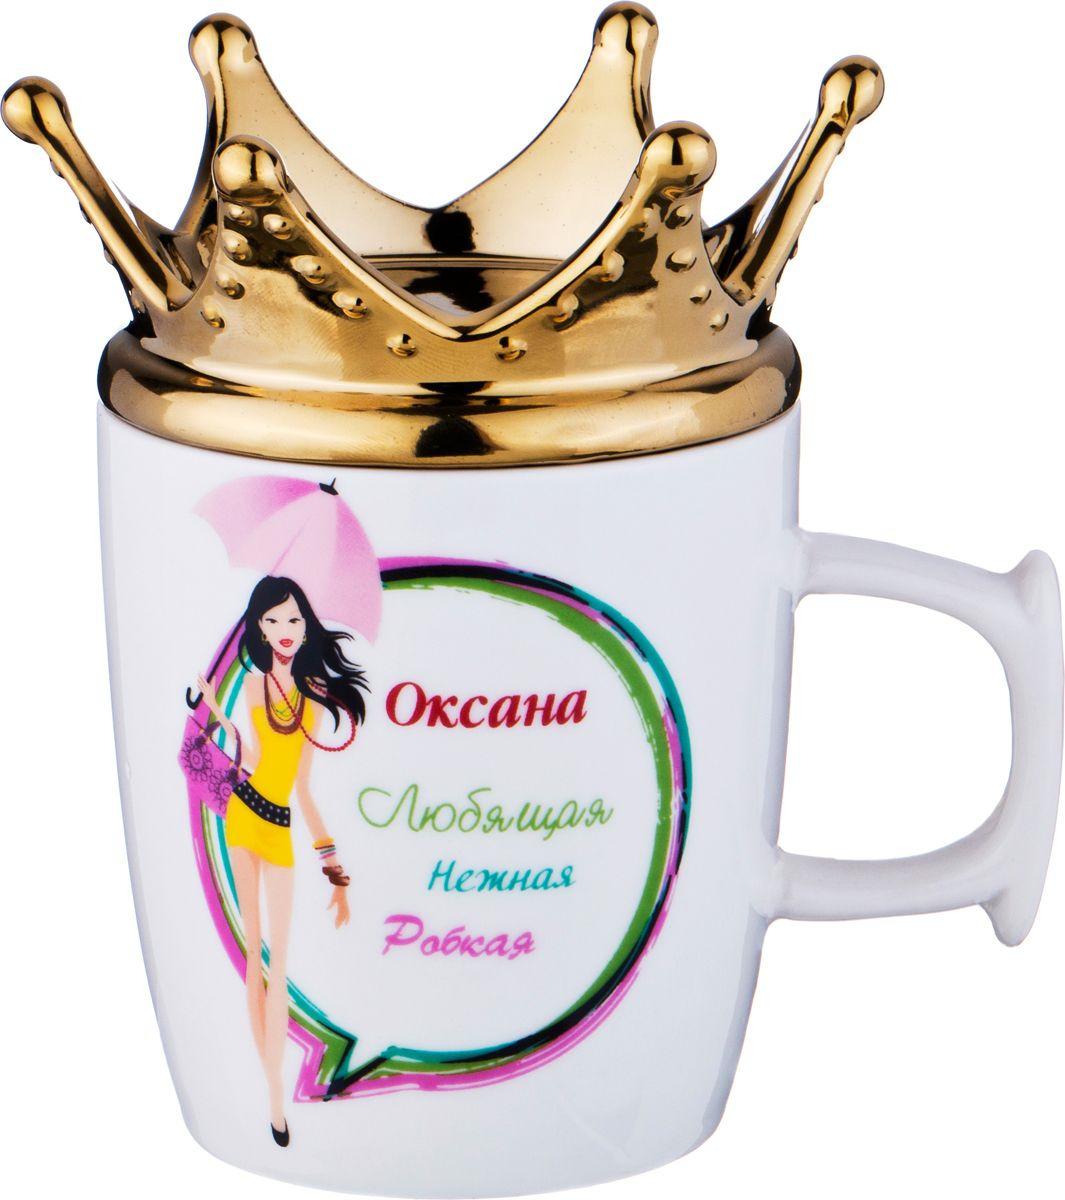 Кружка столовая Lefard Оксана-королева, 383-699, мультиколор, 300 мл